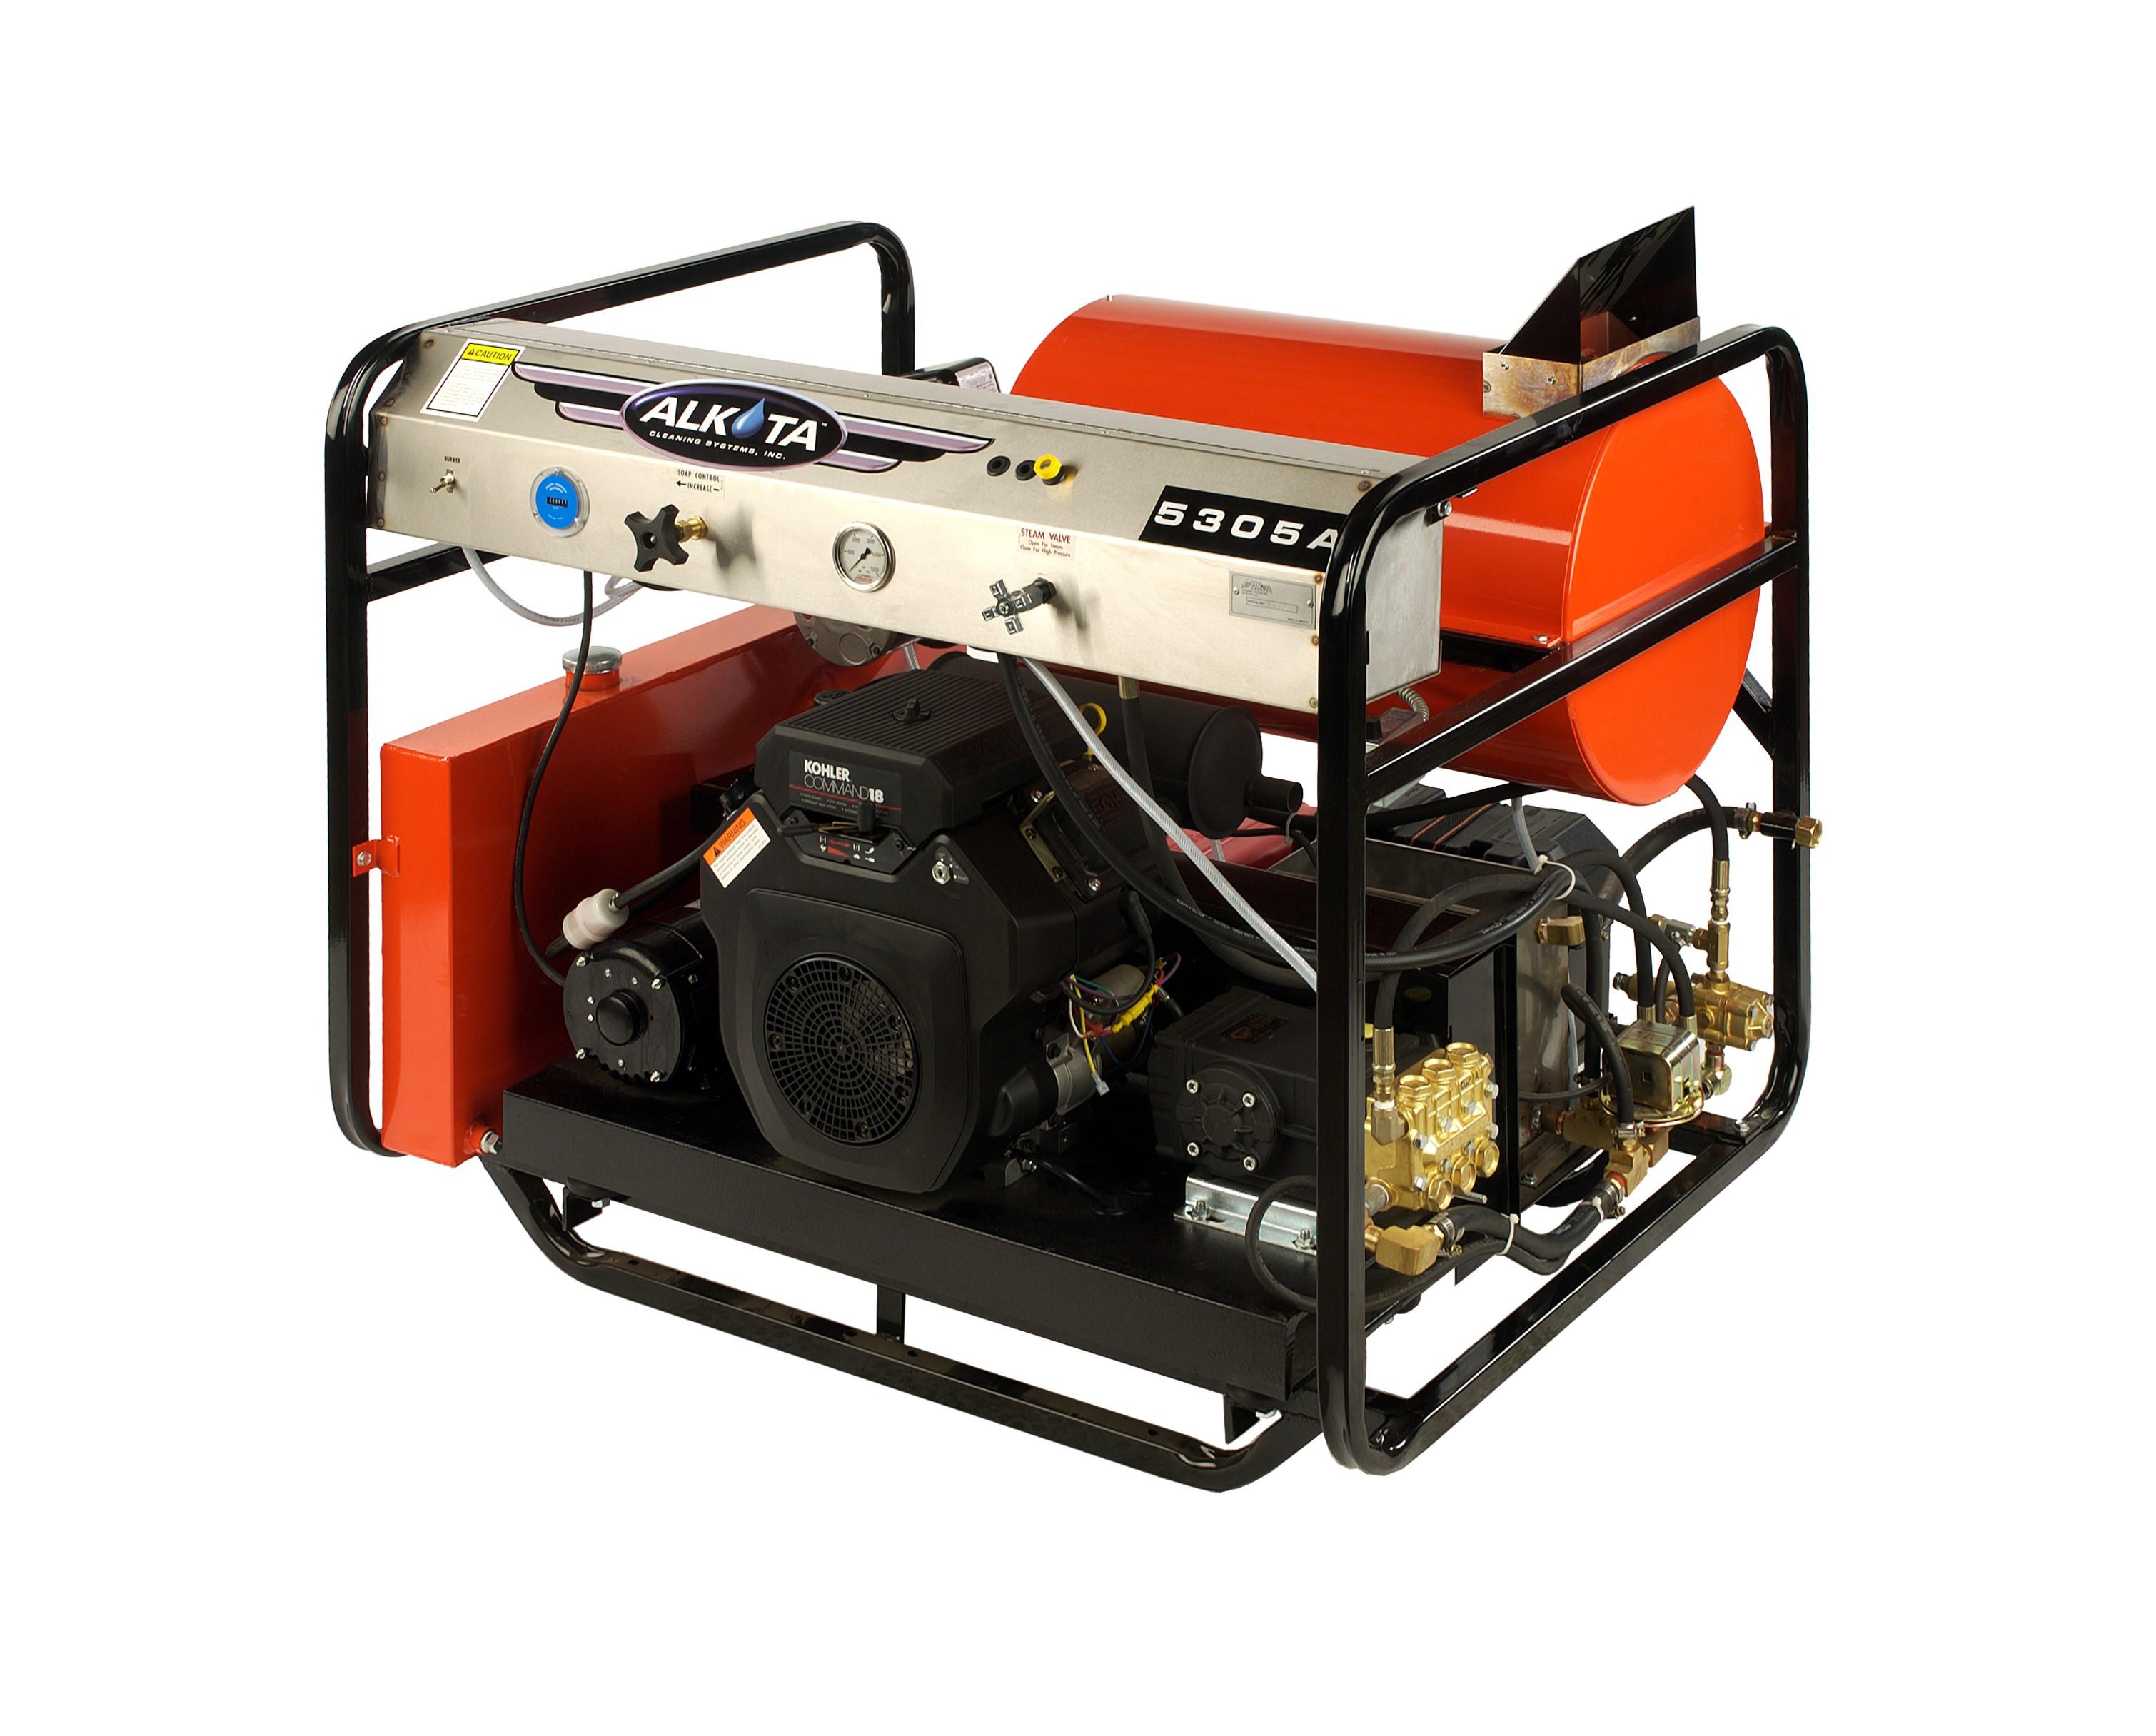 medium resolution of pressure washer hot water gas engine 5305a alkota alkota cleaning alkota wiring diagram